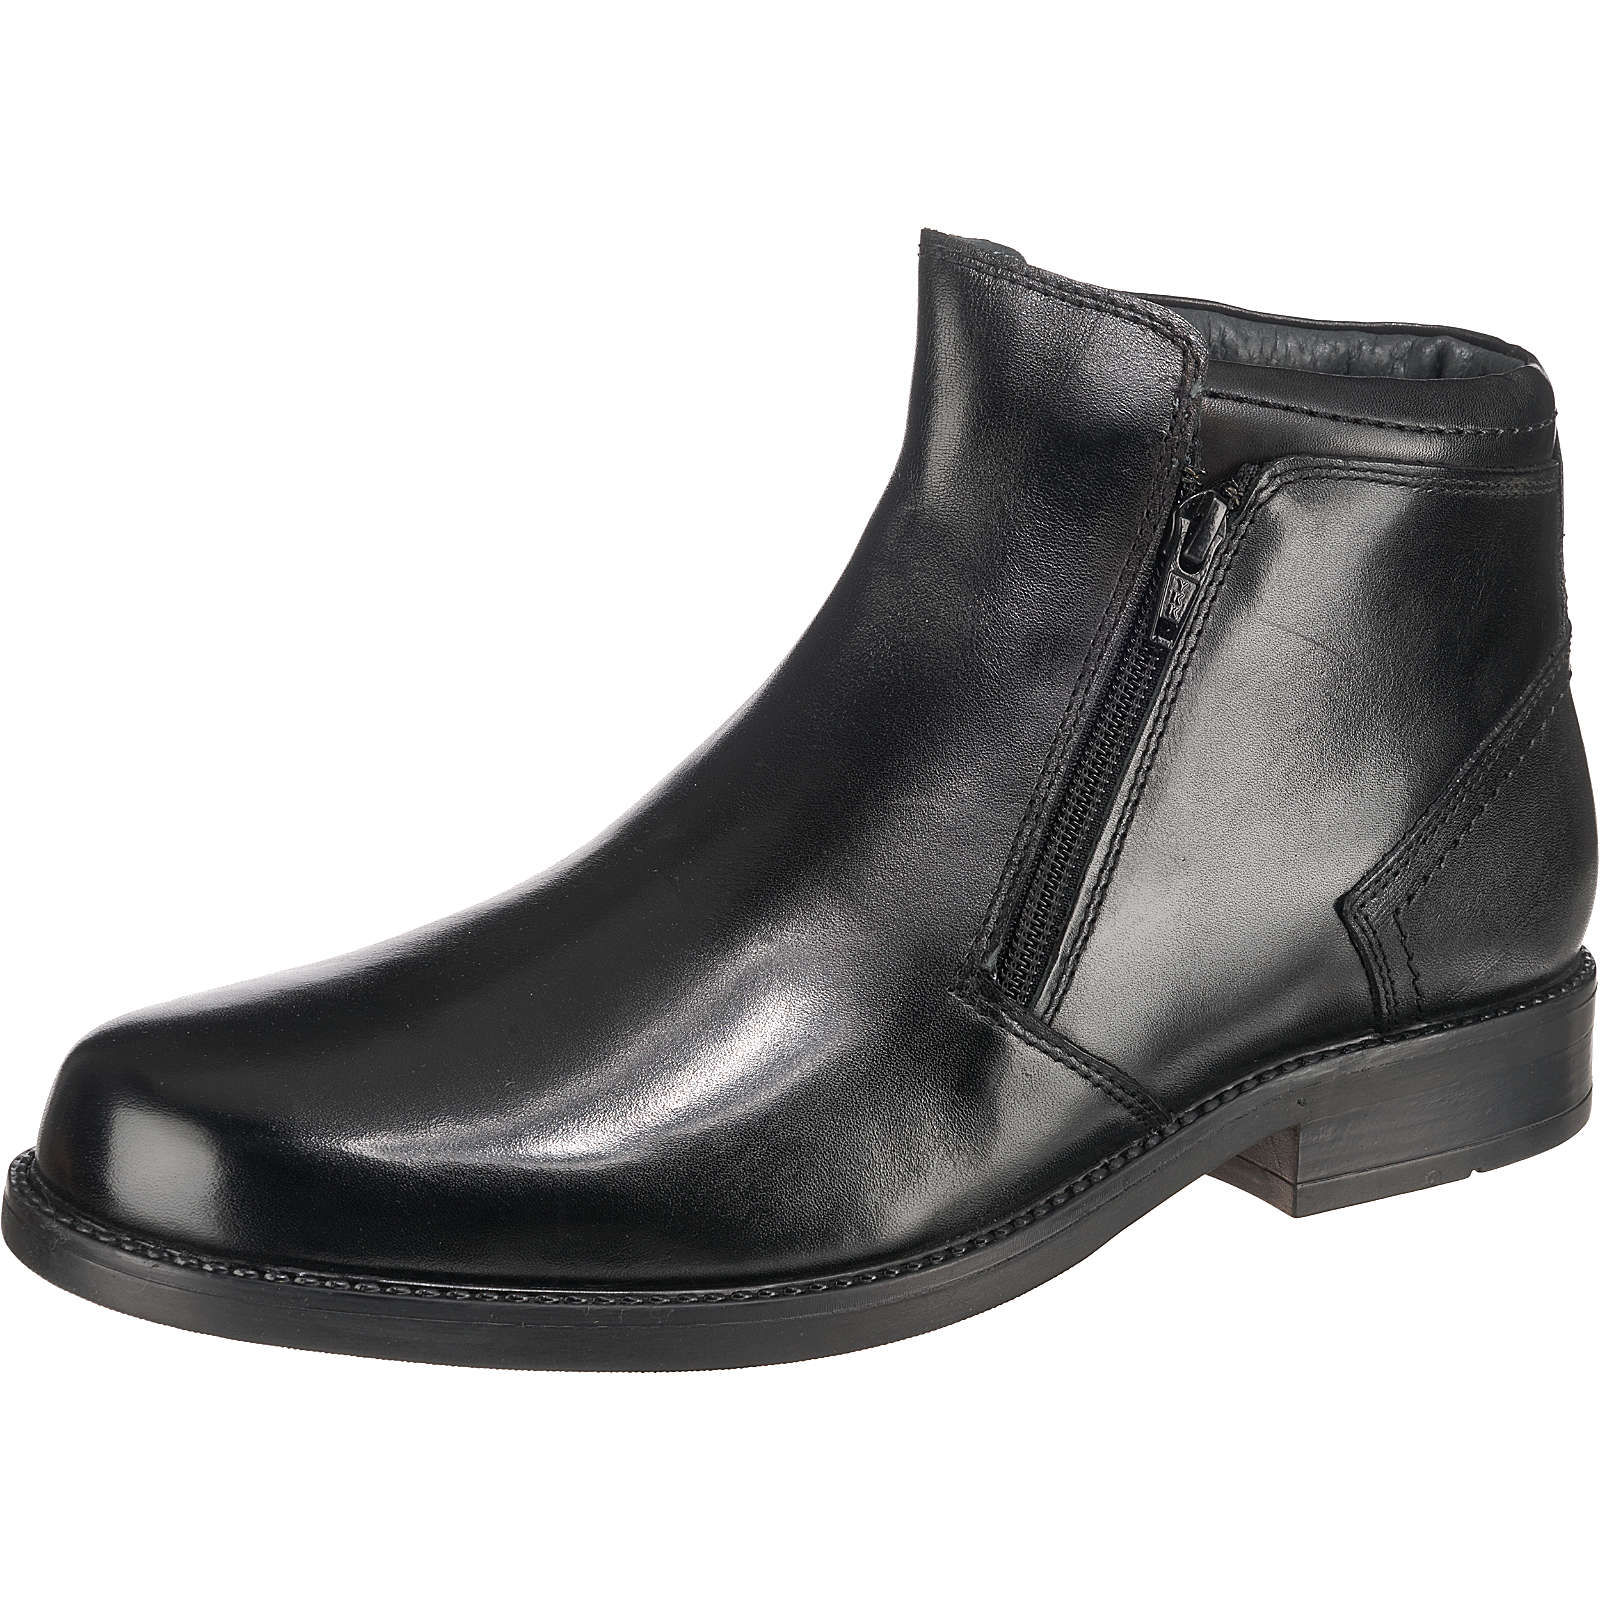 STONEFORD Komfort-Stiefeletten Leder schwarz Herren Gr. 44